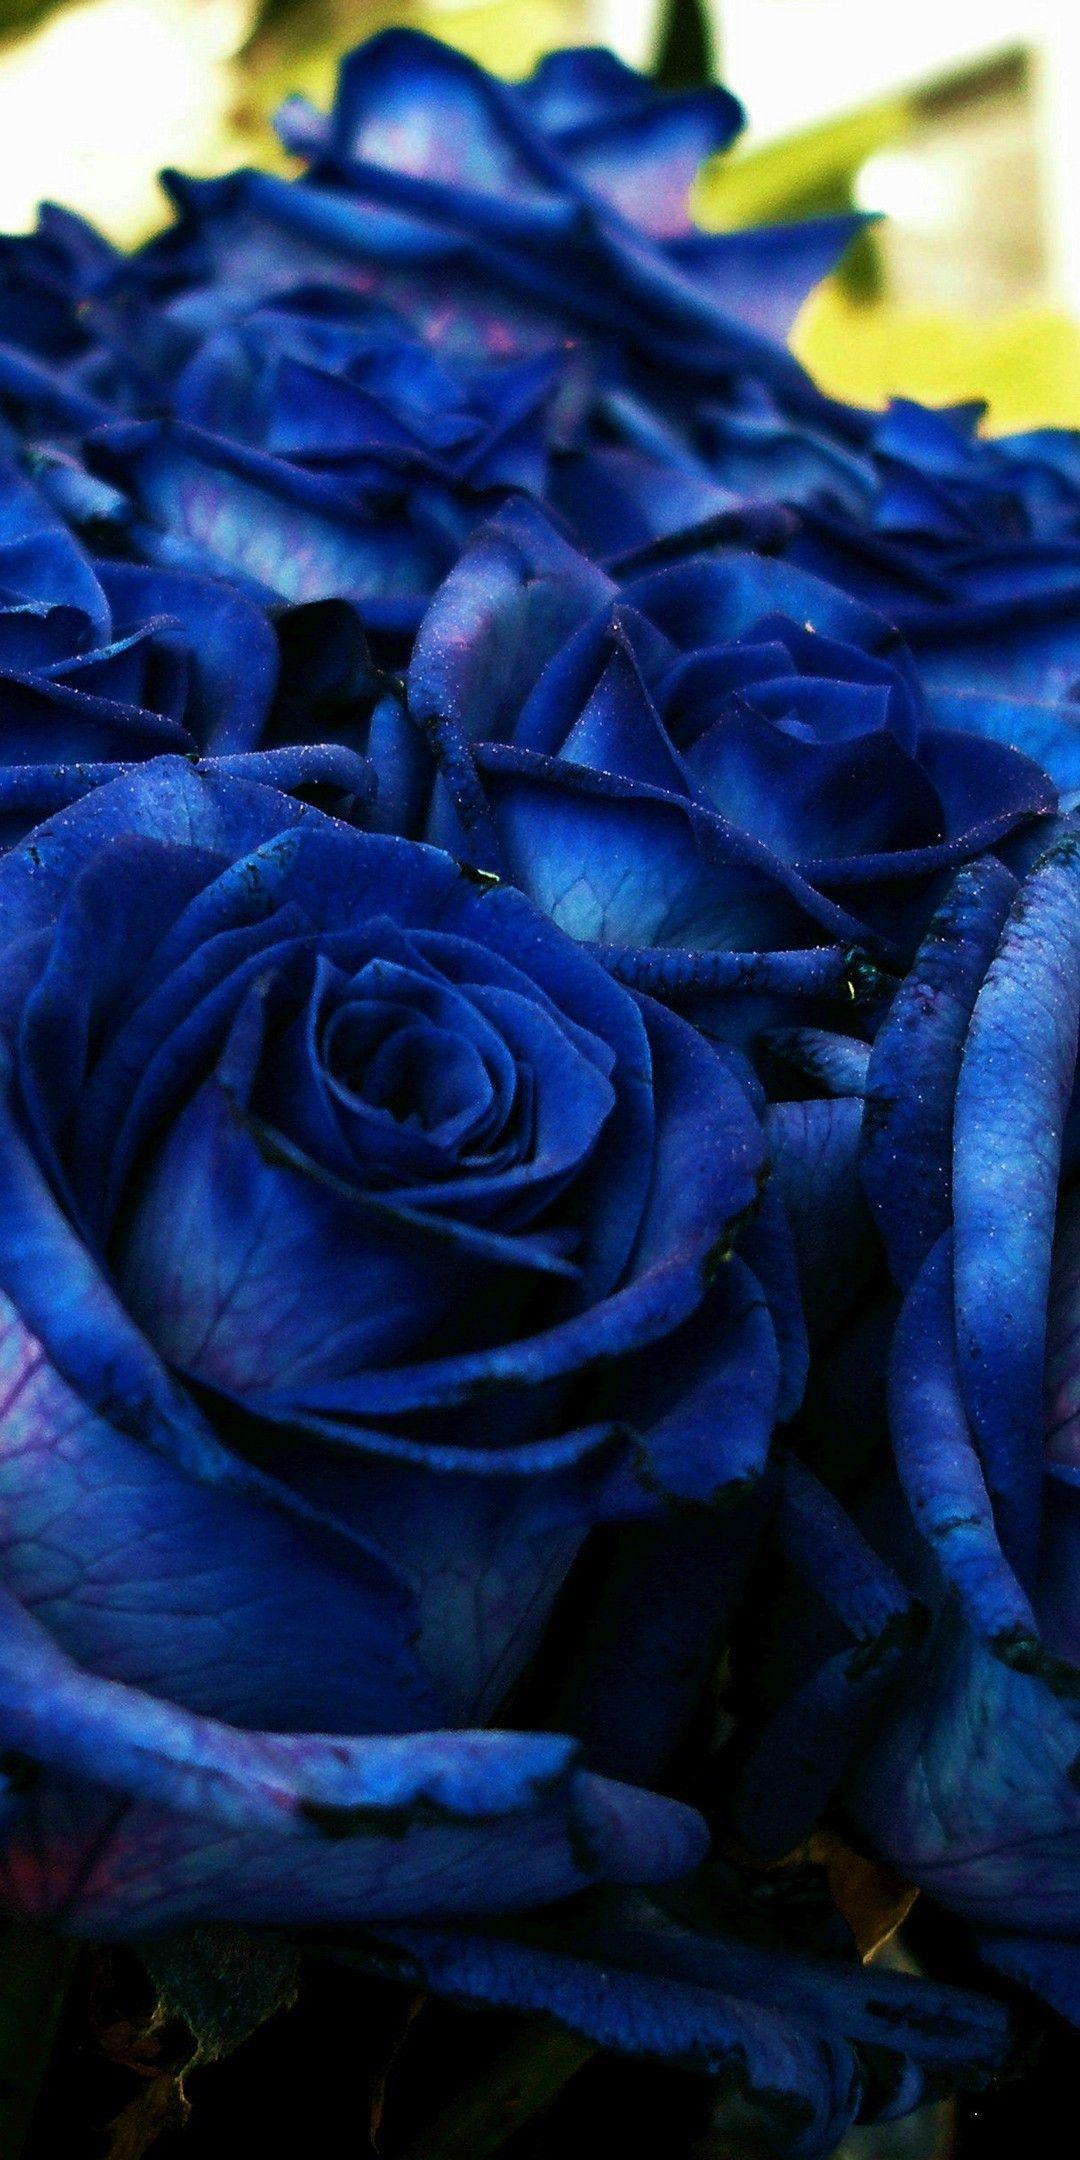 Pin By Paula Eggleston On Kartinki Rozy Blue Roses Wallpaper Cute Blue Wallpaper Blue Roses